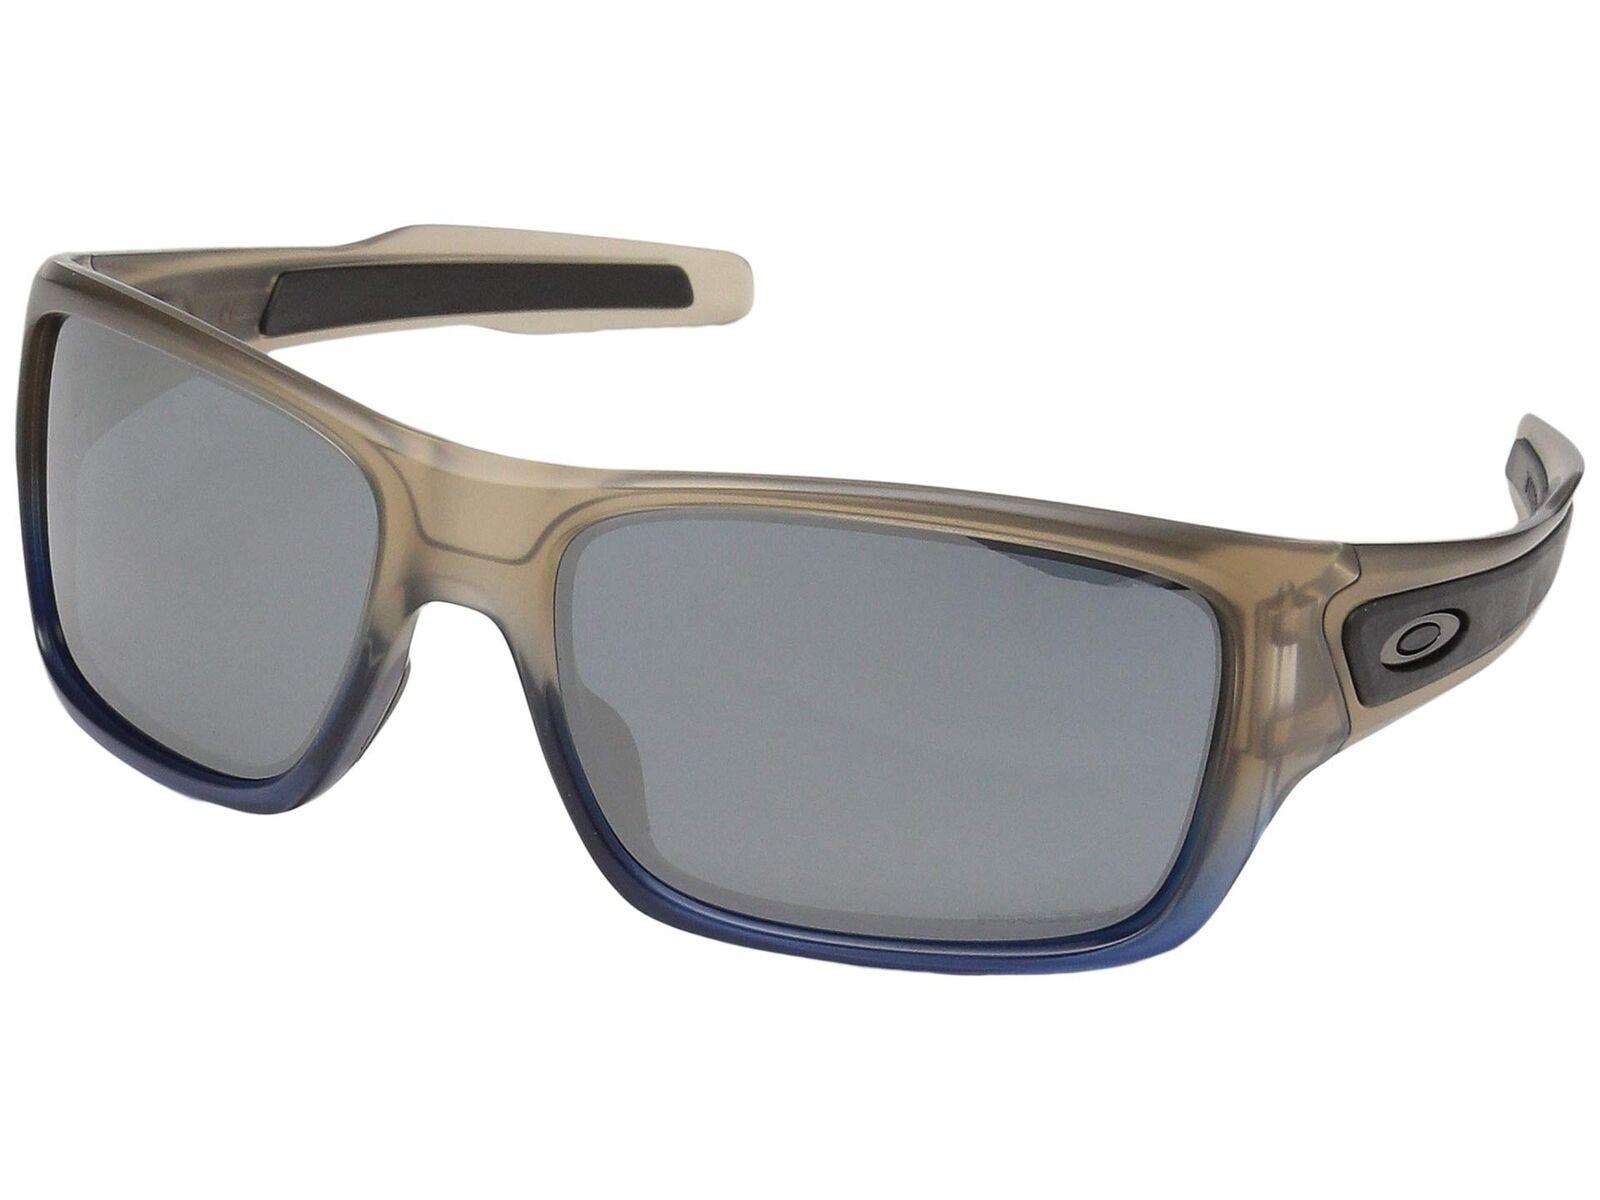 Oakley Turbine OO9263-52 Sunglasses Navy Mist Prizm Black Lens 9263 ... 5dc416ef6a